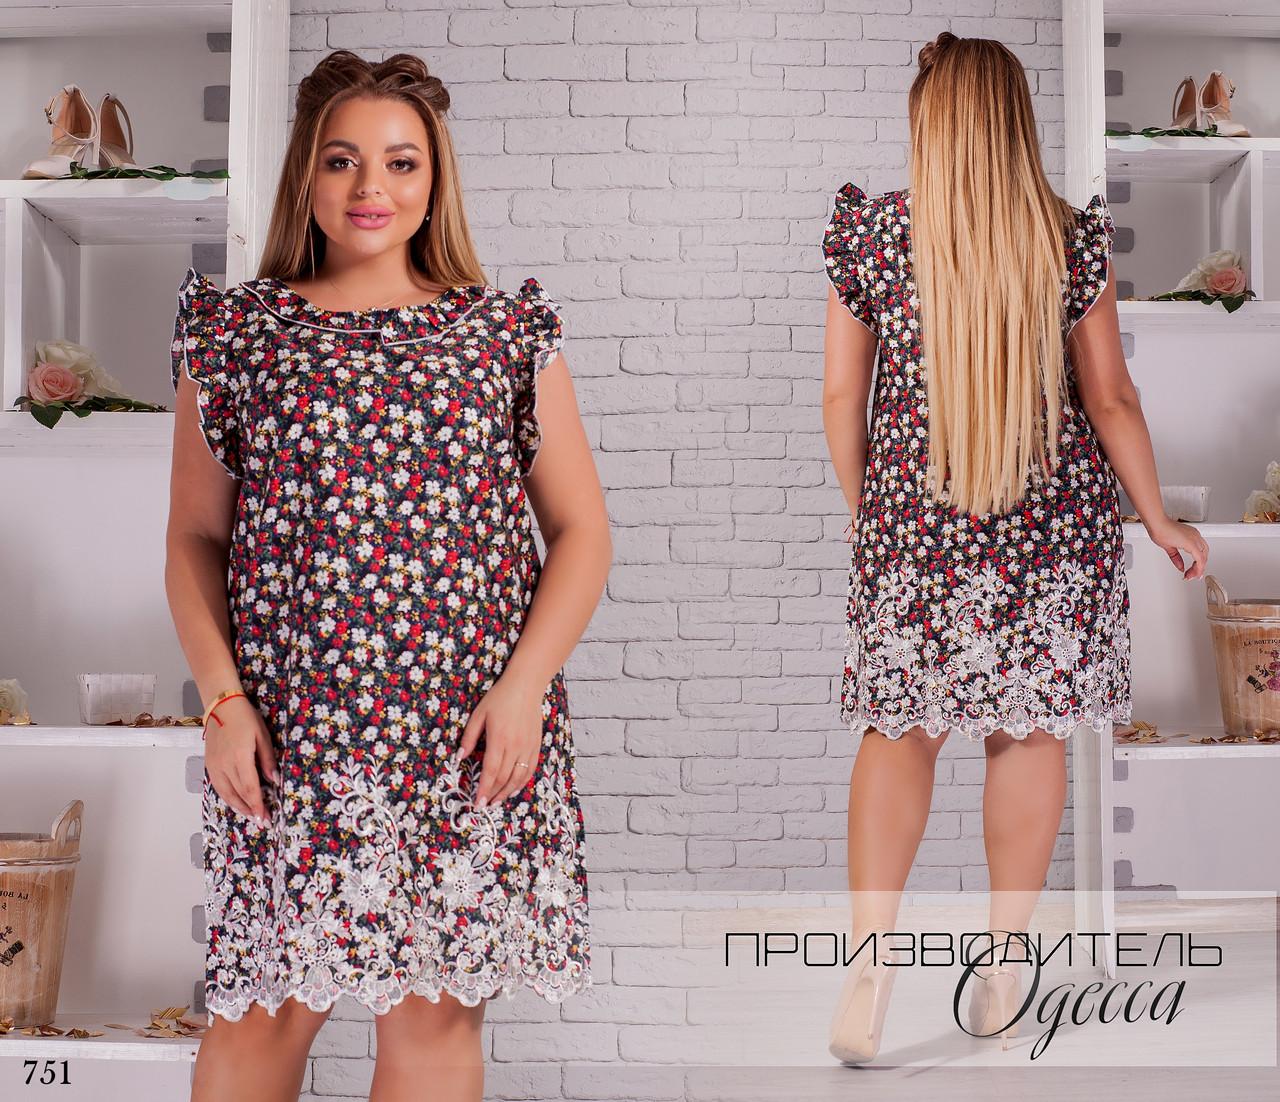 Платье без рукав короткое коттон+вышивка 50,52,54,56,58,60